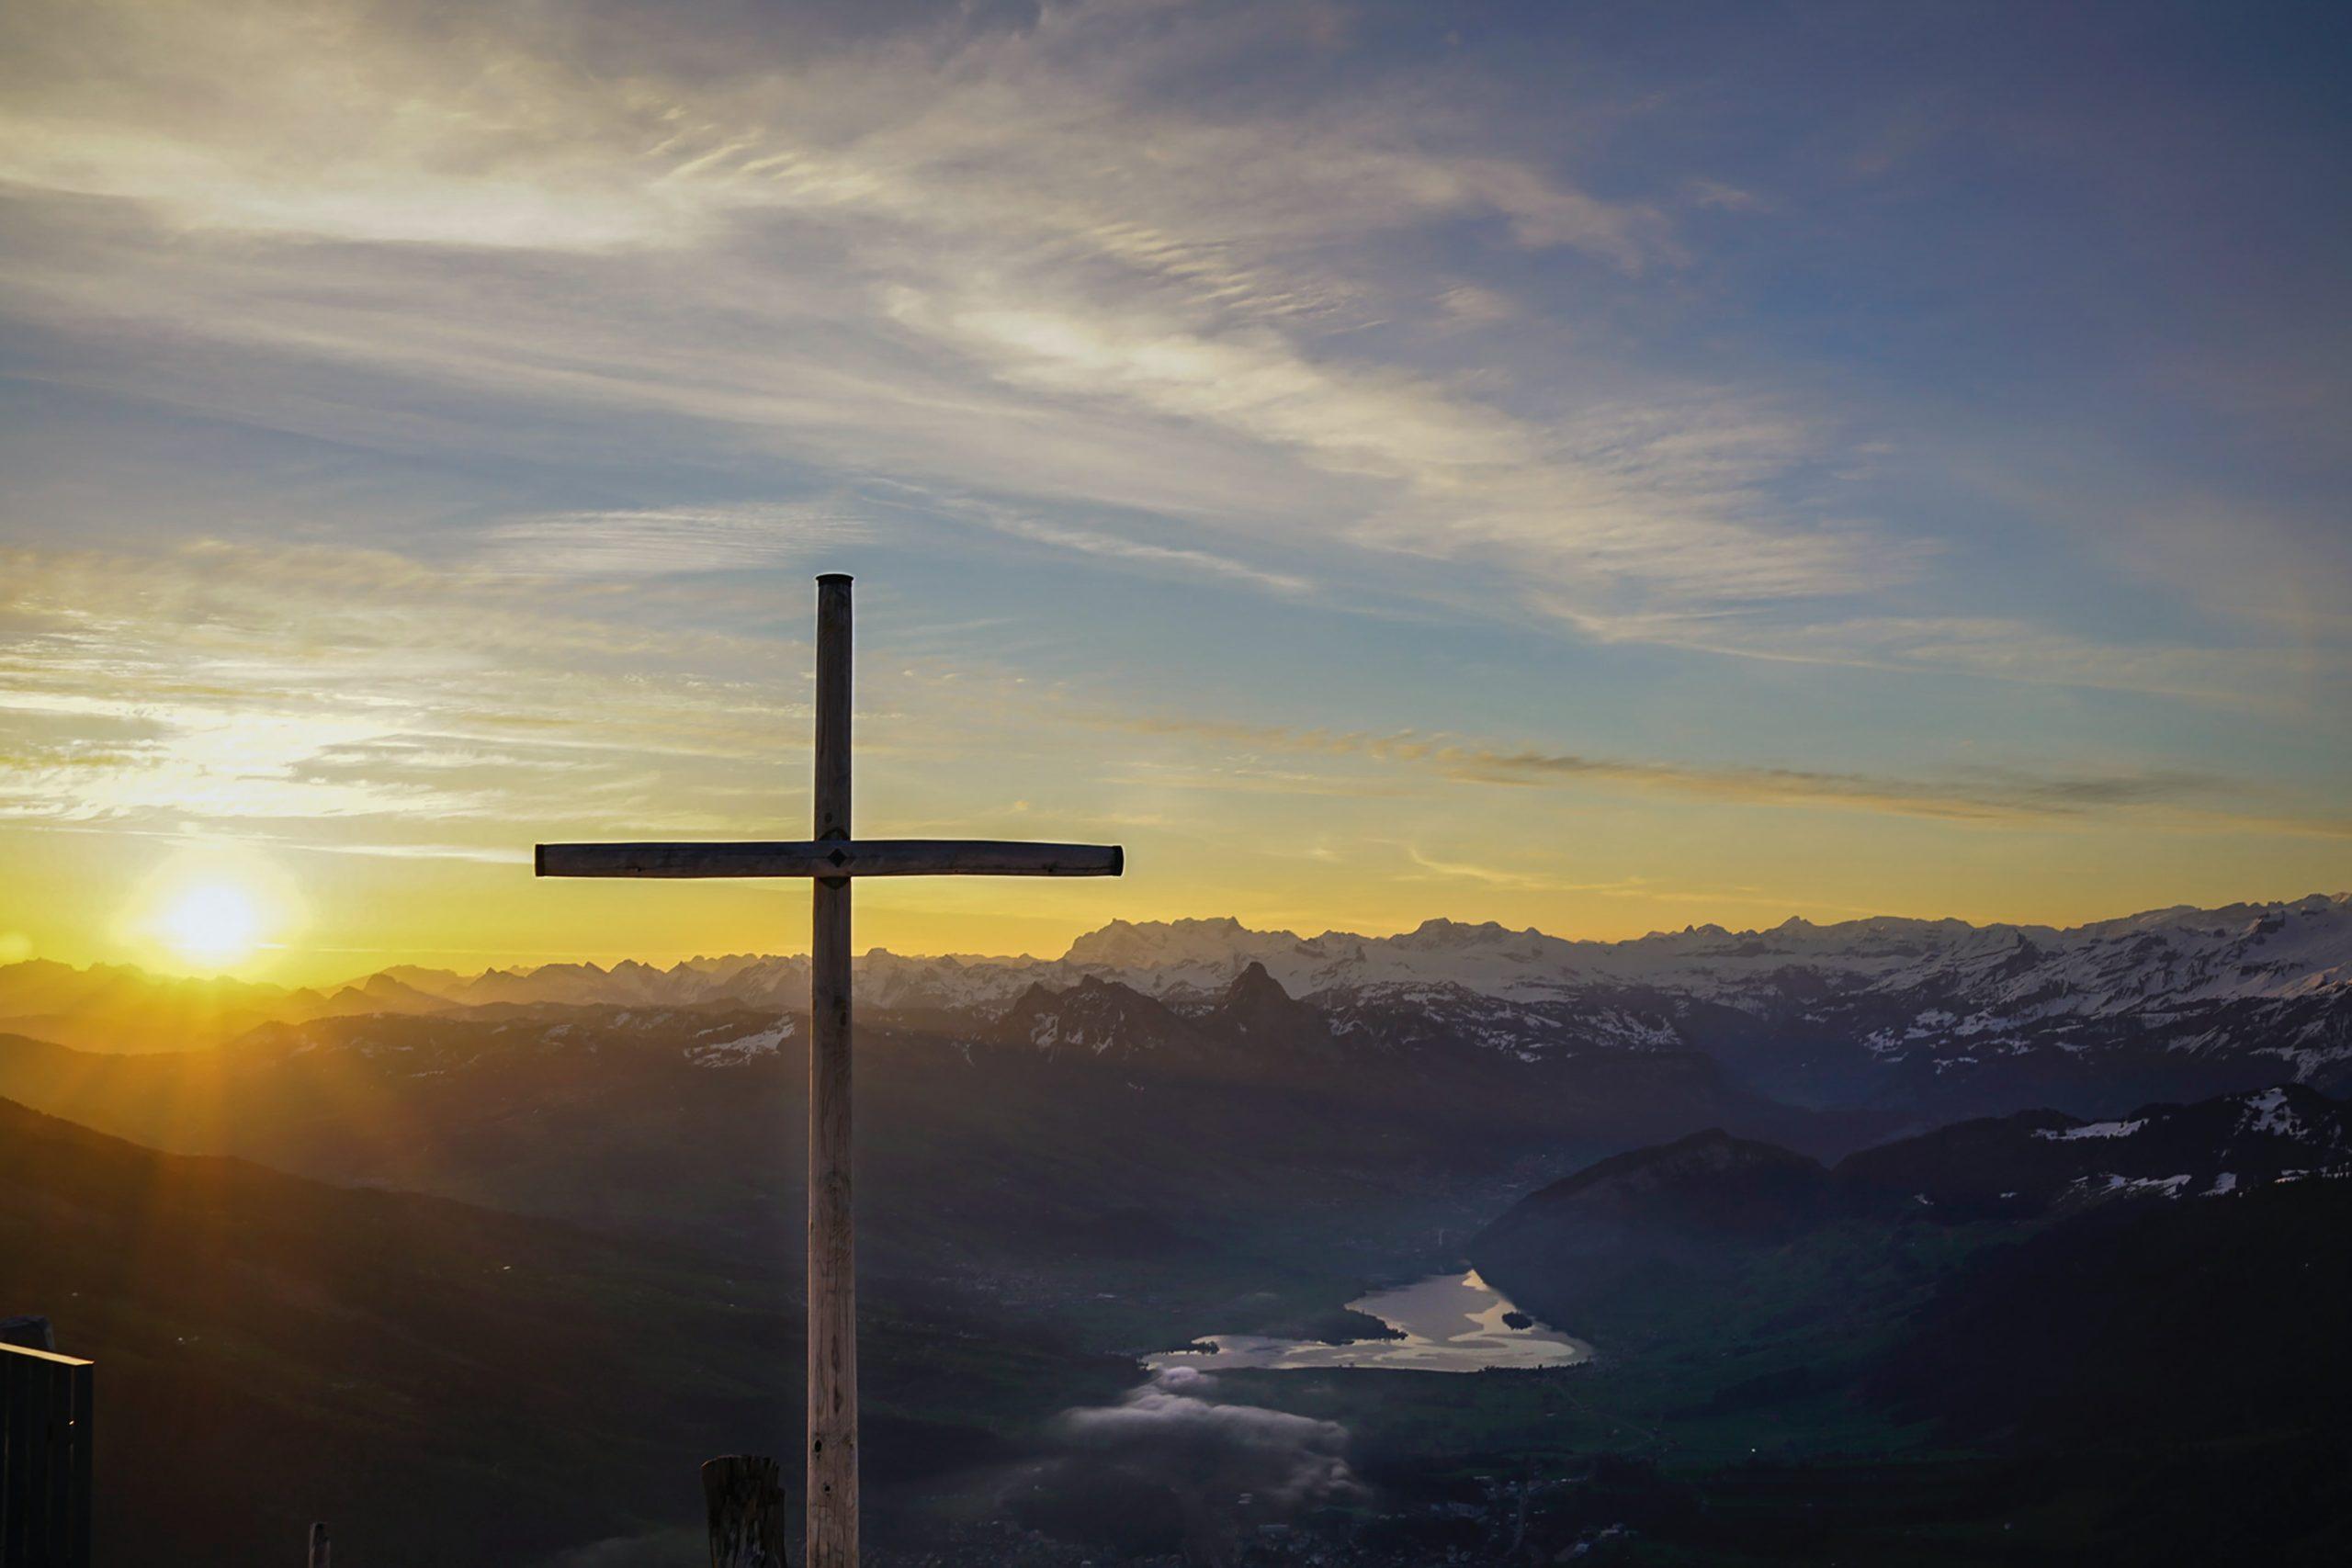 Session 5 – Retreat in prayer